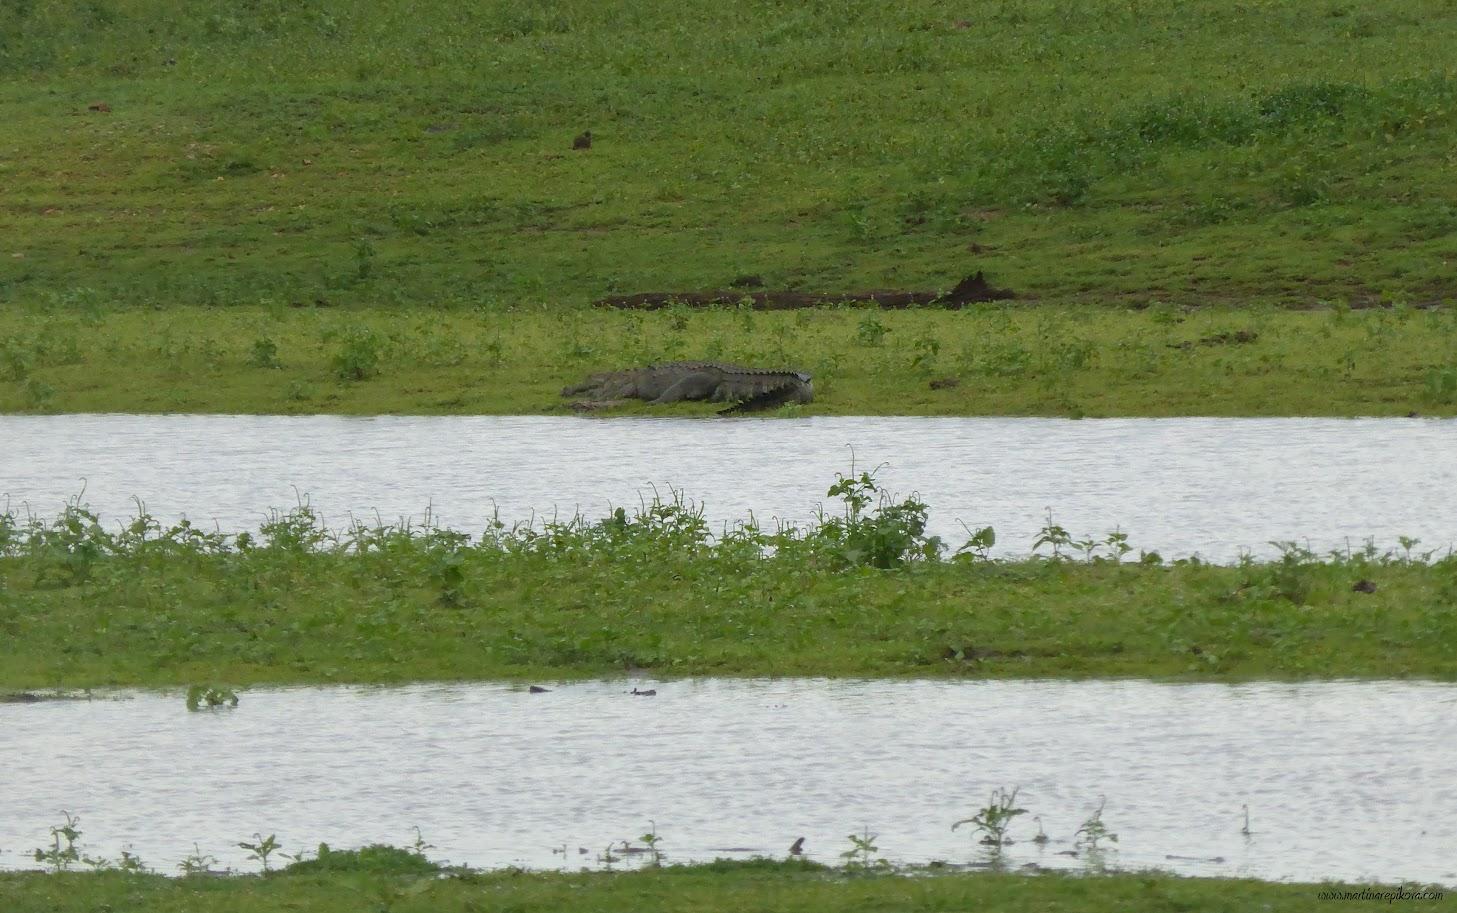 Sleeping crocodile on the shore of Uda Walawe reservoir, Sri Lanka